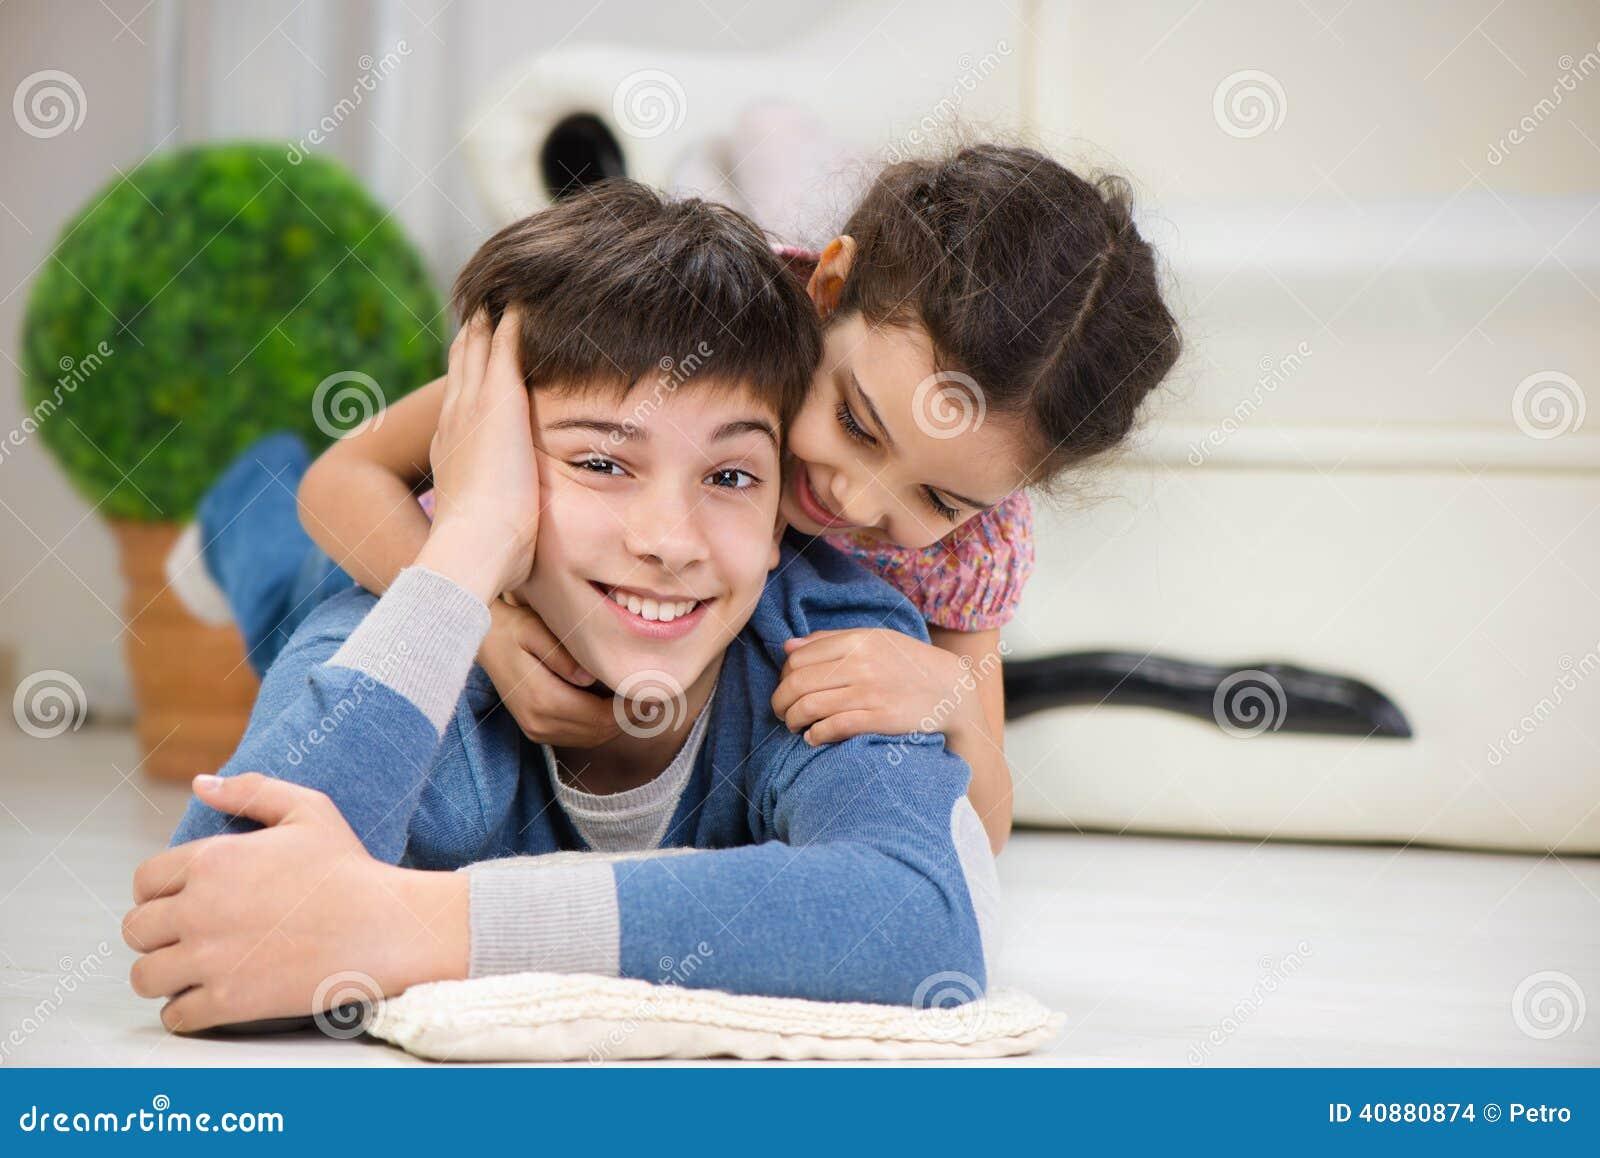 brat-trahnul-sestru-geymershu